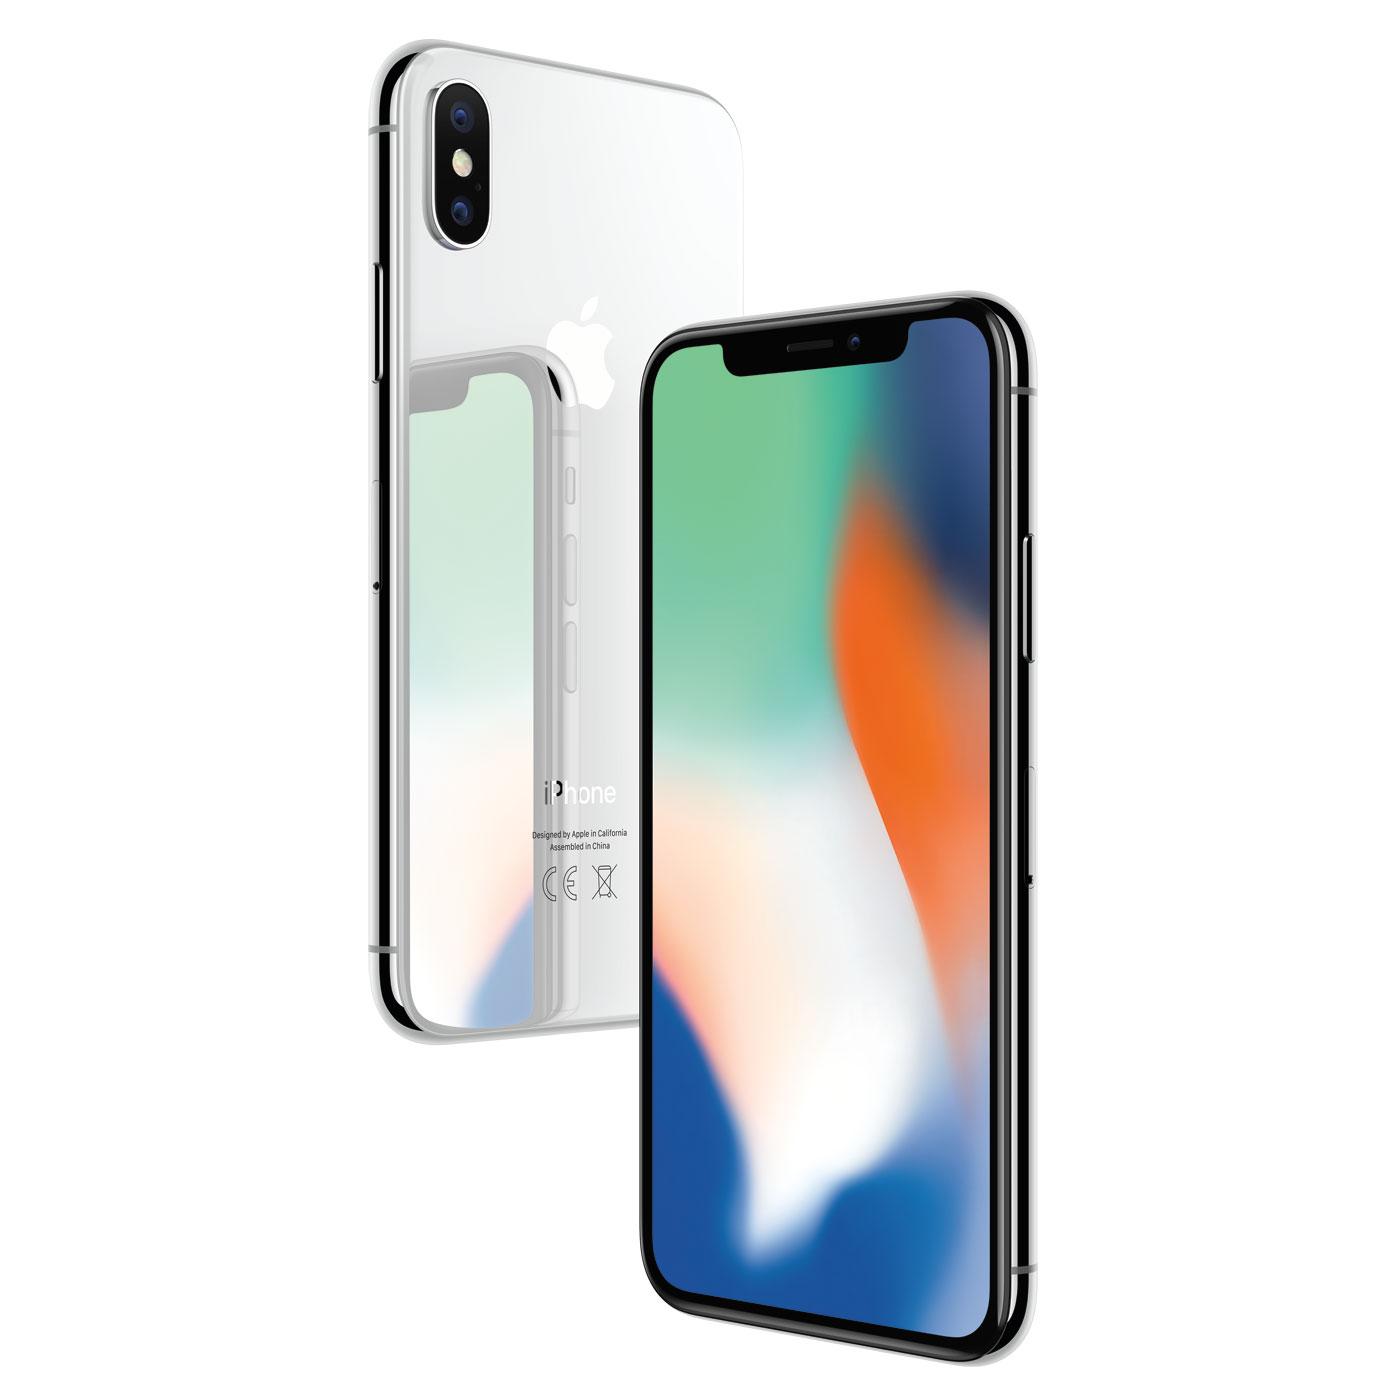 Apple iPhone X 256Go Argent - Téléphonie Apple - Cybertek.fr - 2